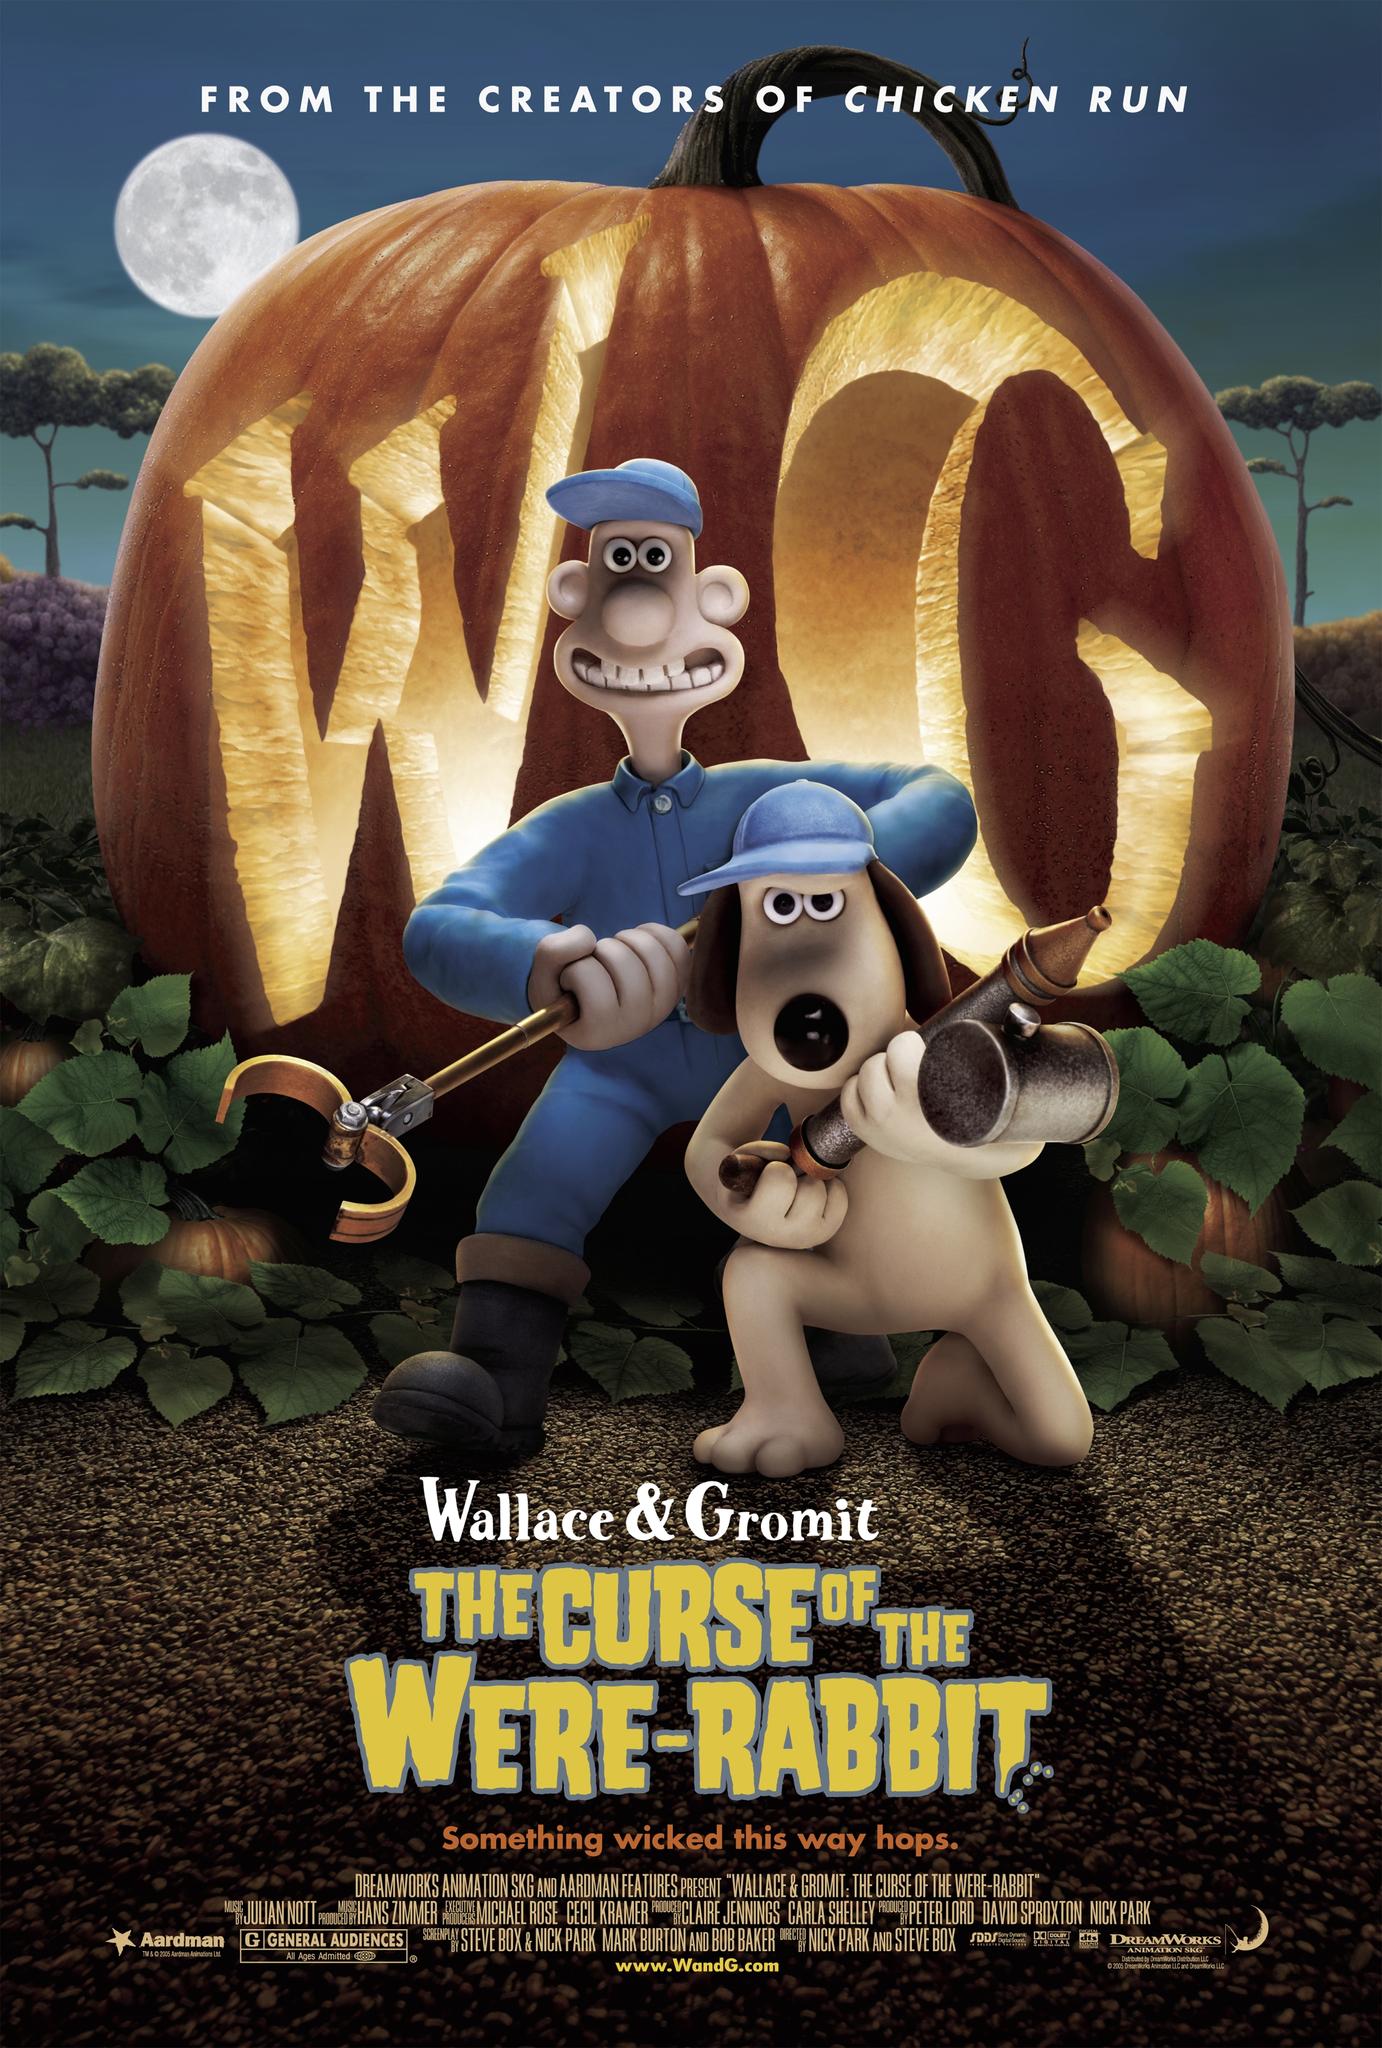 File:Wallace gromit were rabbit poster.jpg